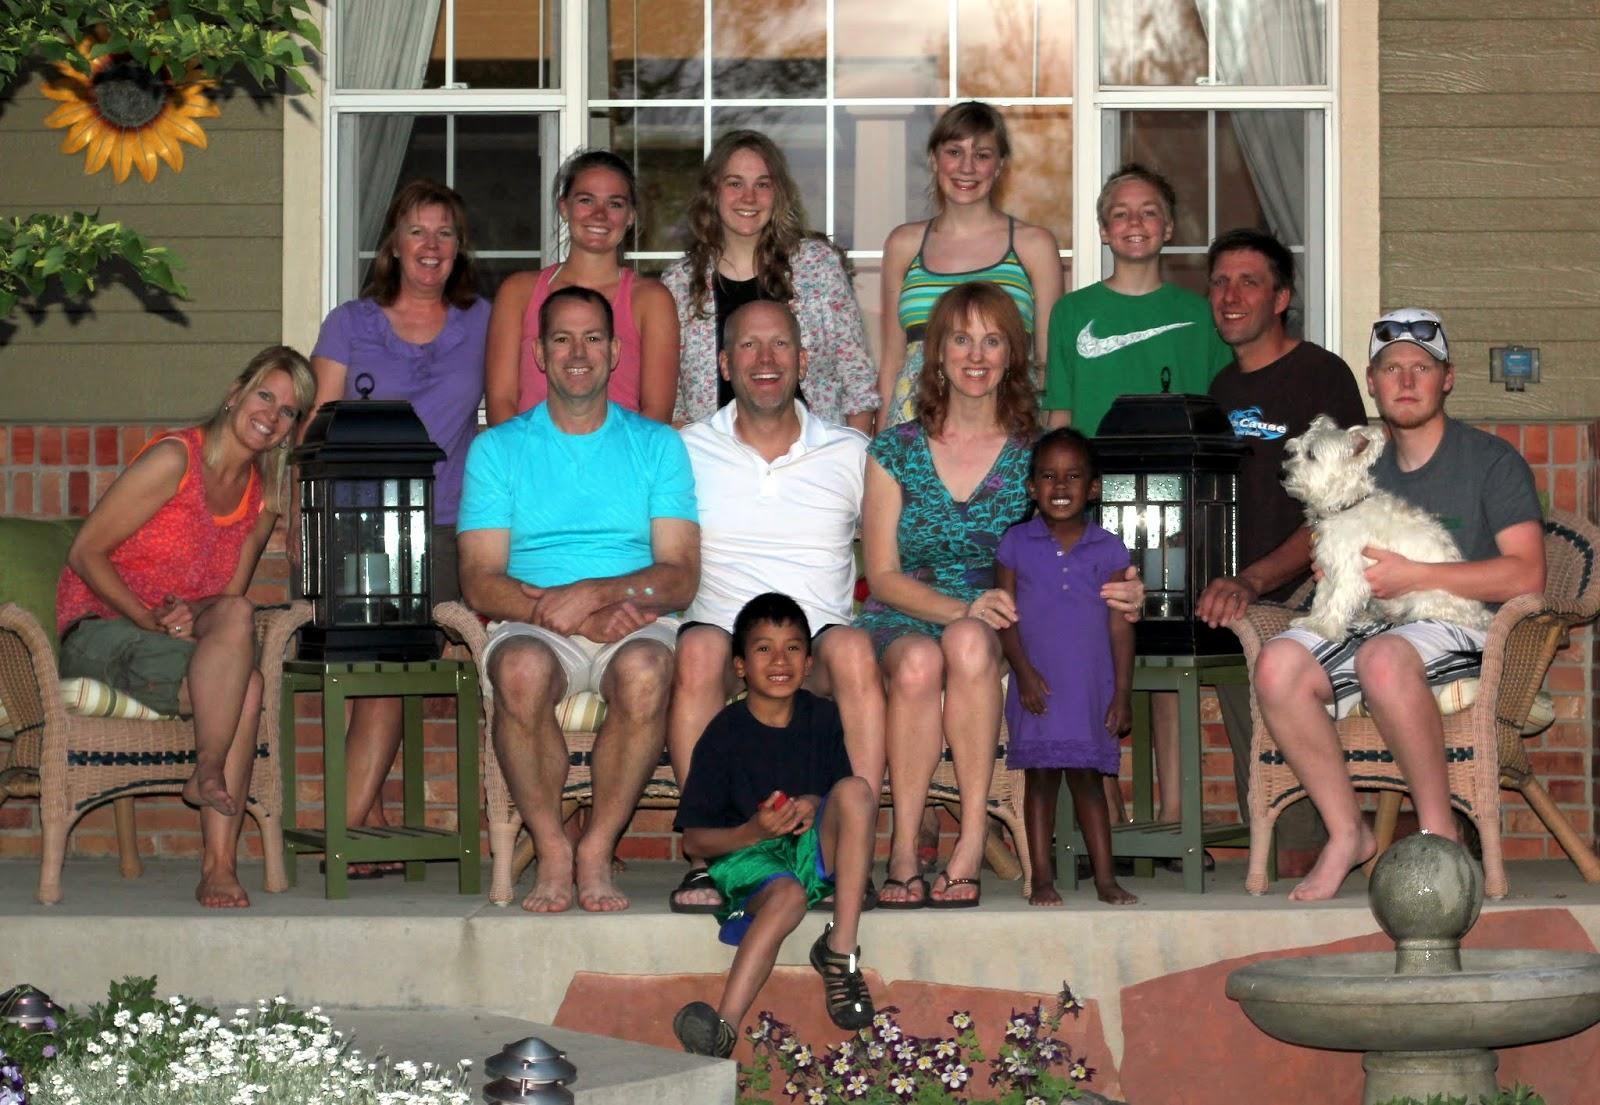 spank Family gathering